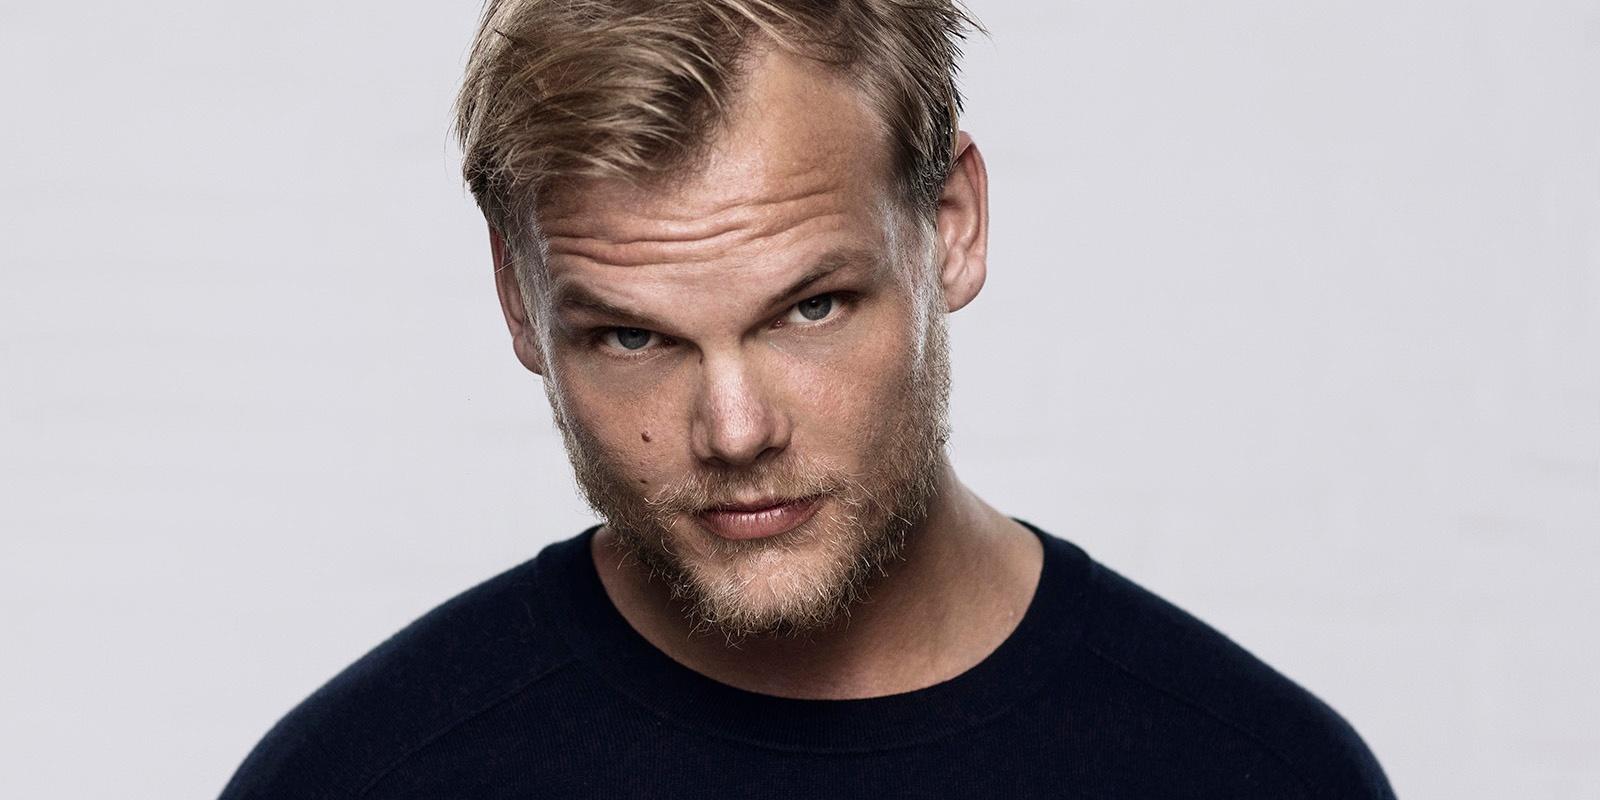 Swedish DJ Avicii has died